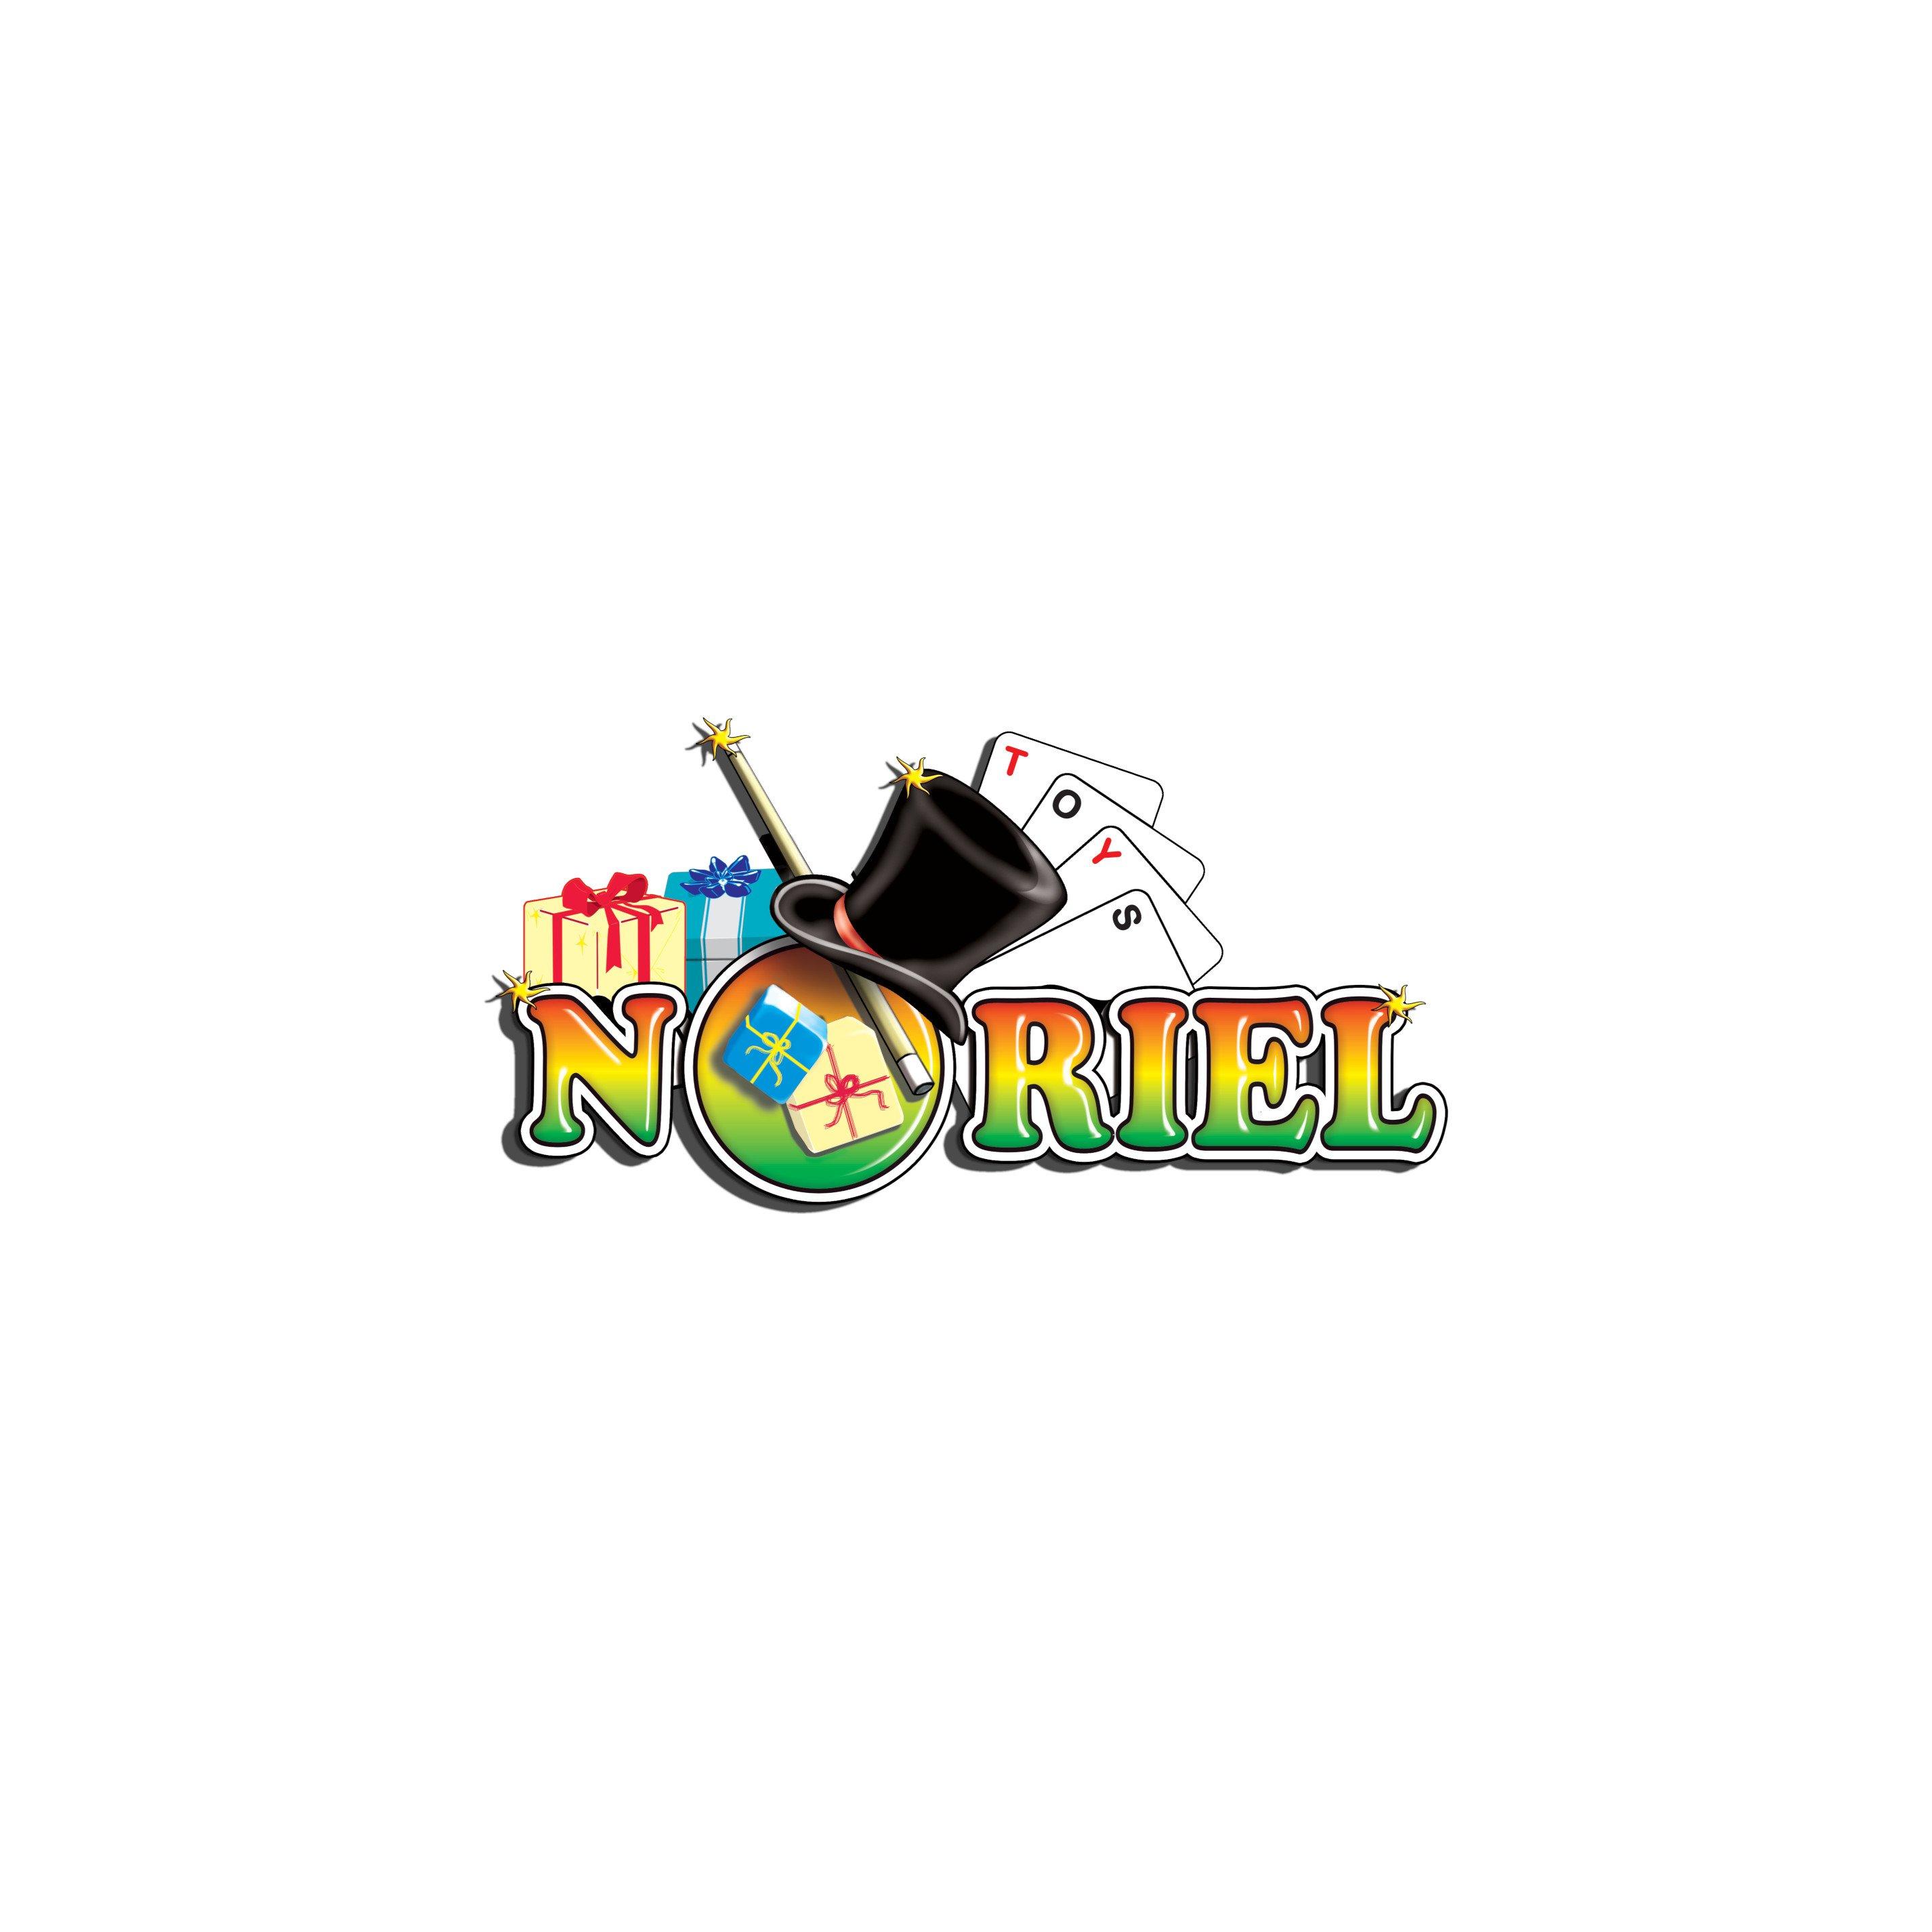 Ansamblu de joaca pentru copii 4 in 1 Dolu imagine 2021